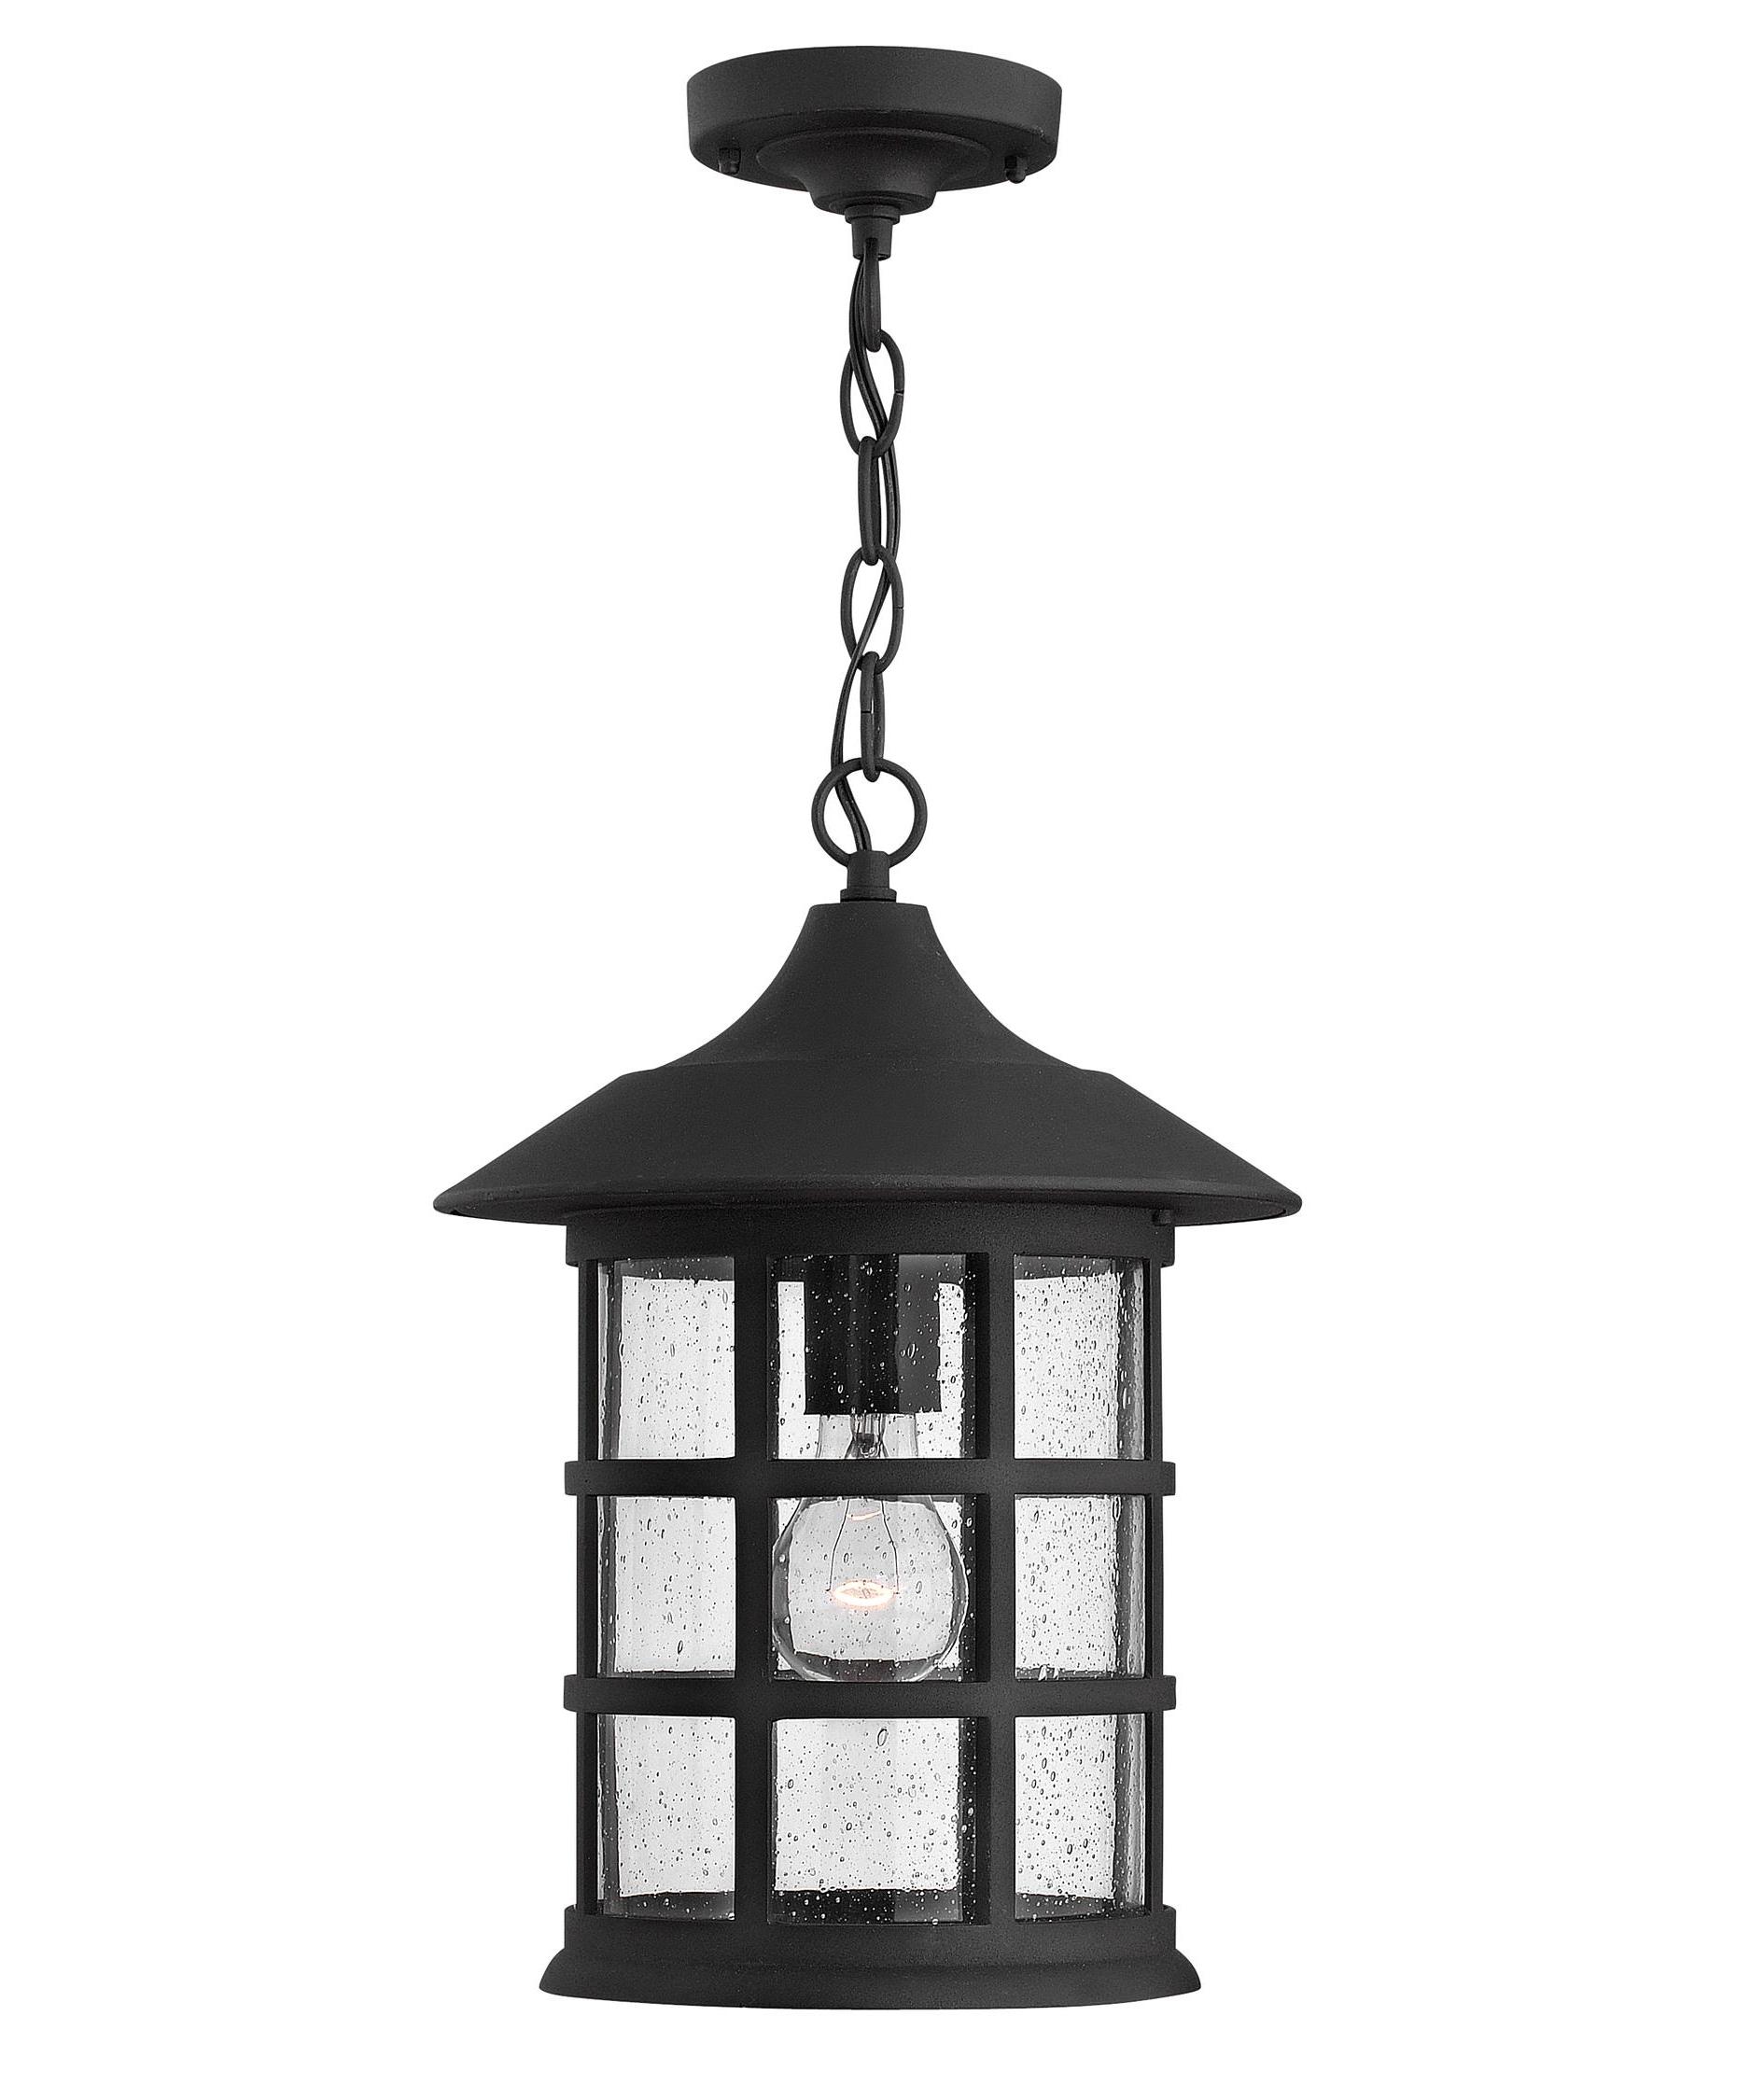 Most Popular Hinkley Lighting 1802 Freeport 10 Inch Wide 1 Light Outdoor Hanging In Hinkley Outdoor Ceiling Lights (View 13 of 20)